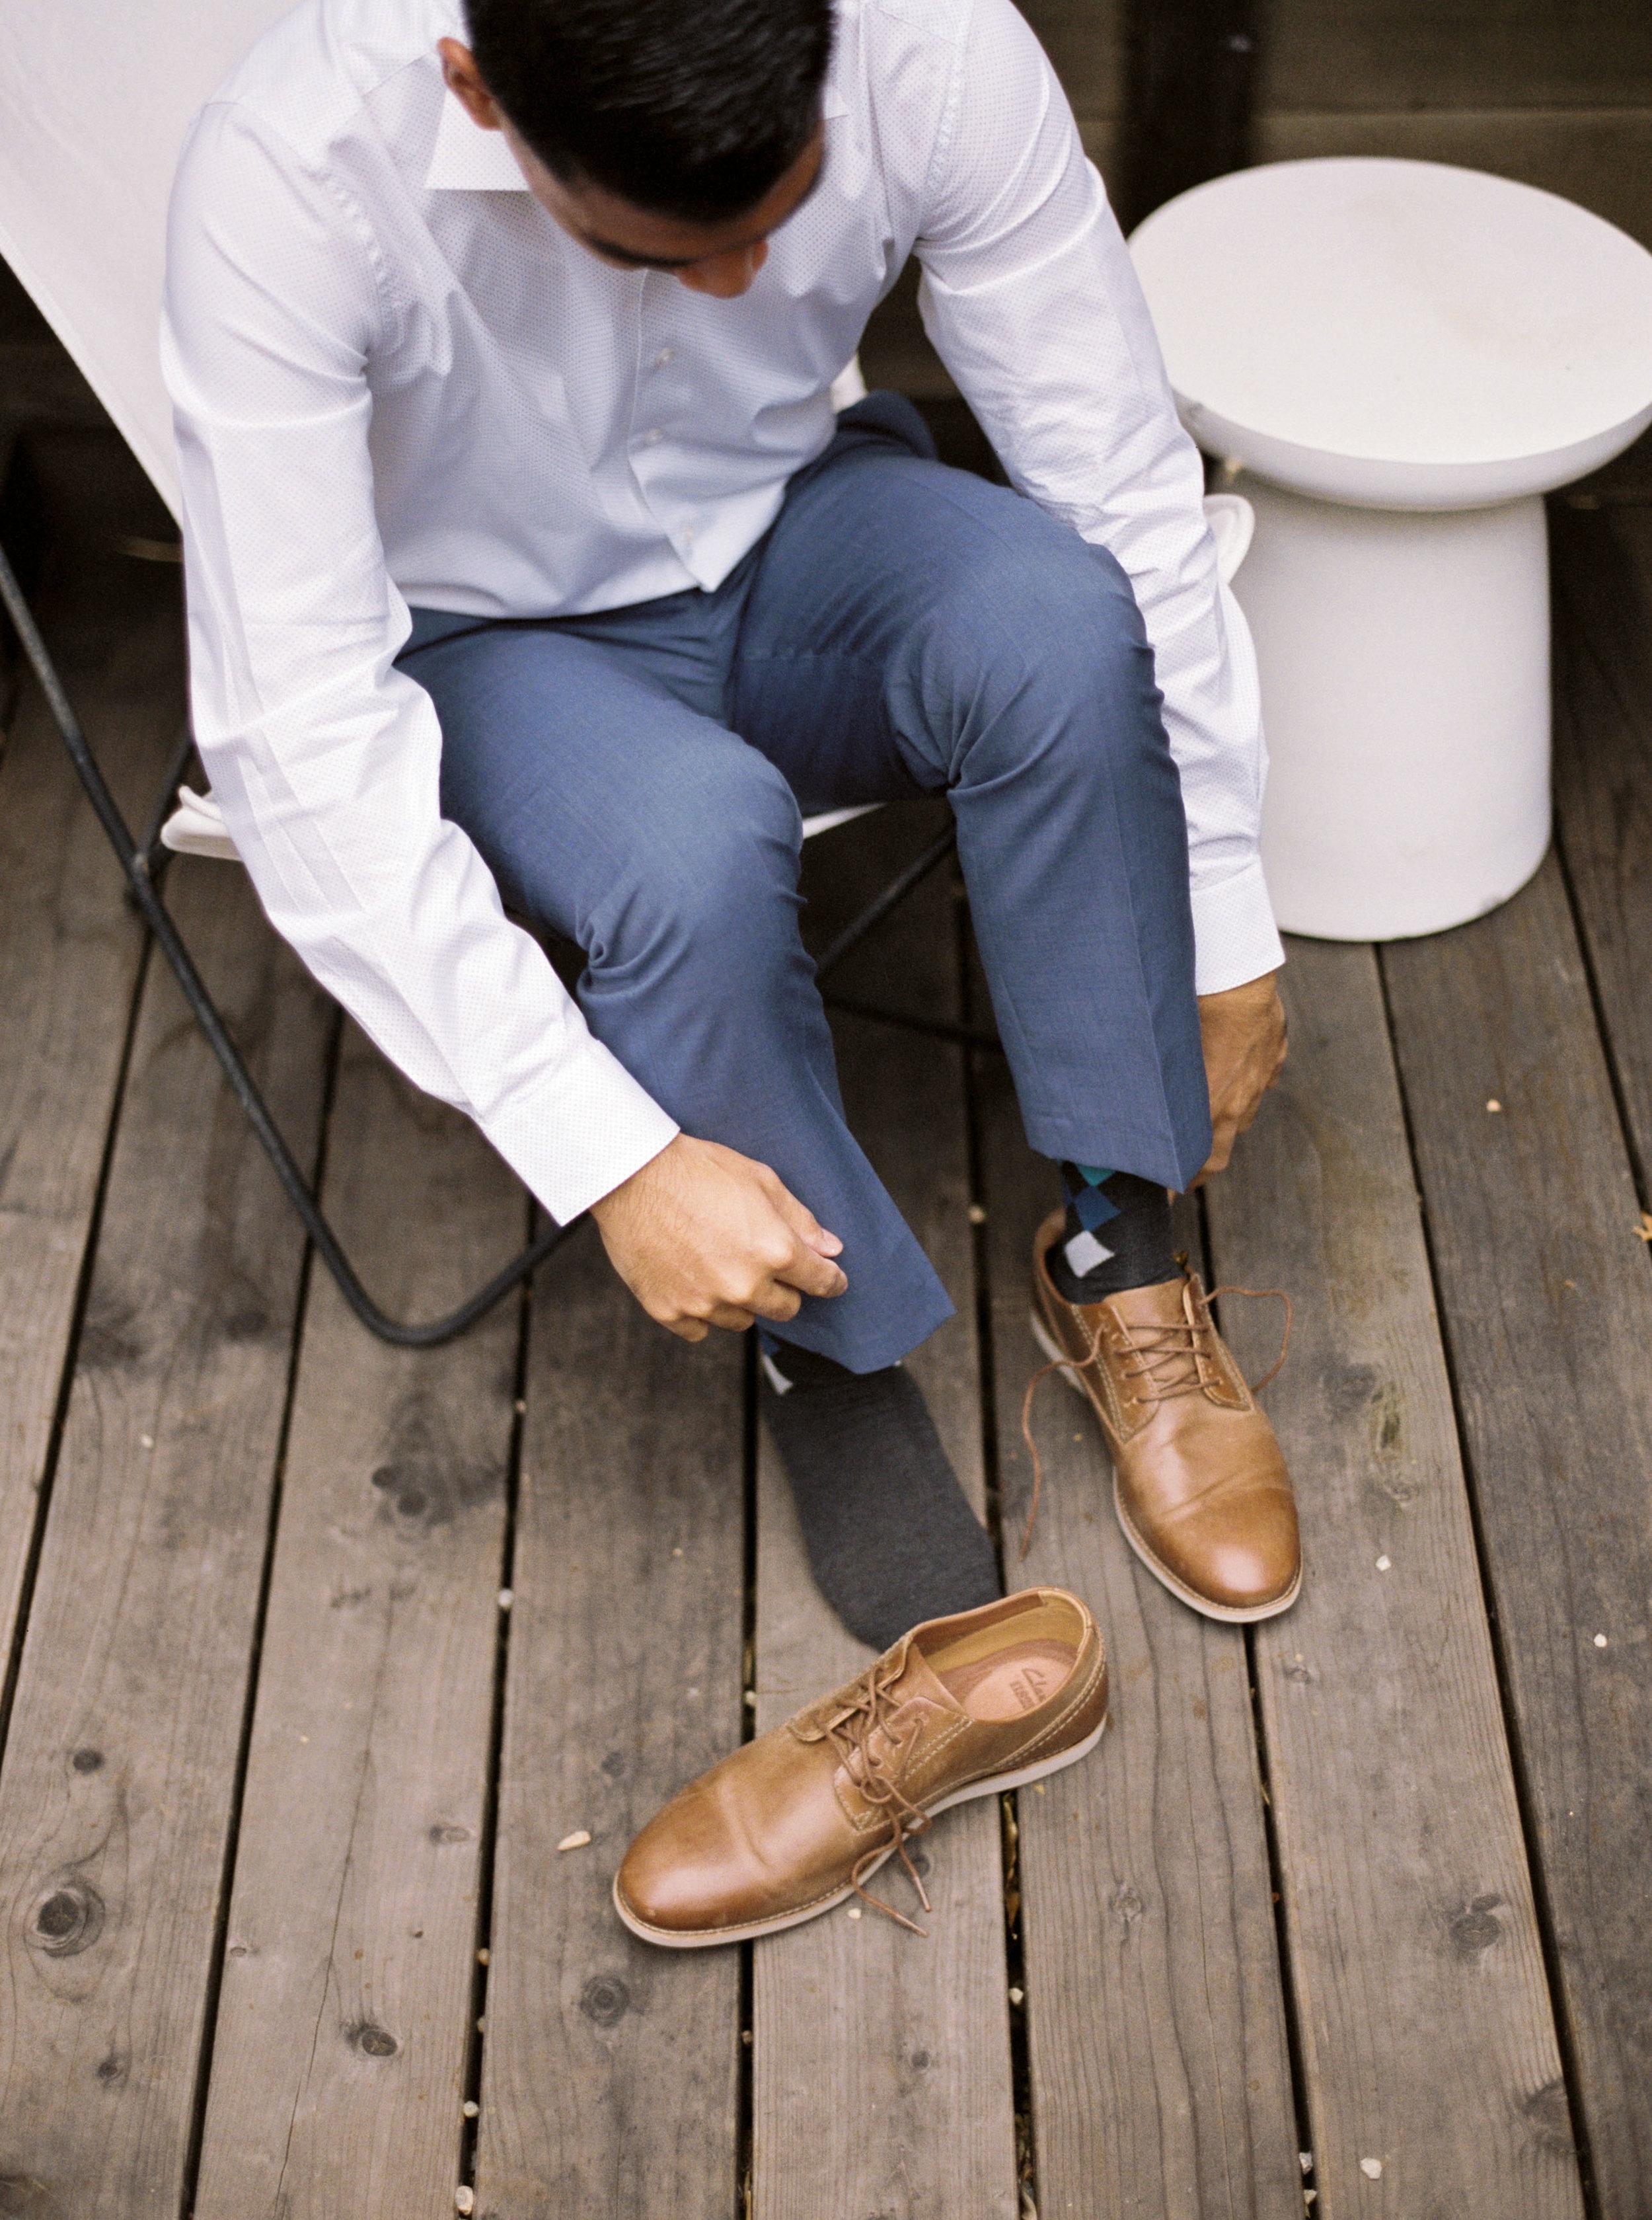 015_Krysten-Crebin-Bay-Area-Elopement-Wedding-Photographer-Videographer.jpg